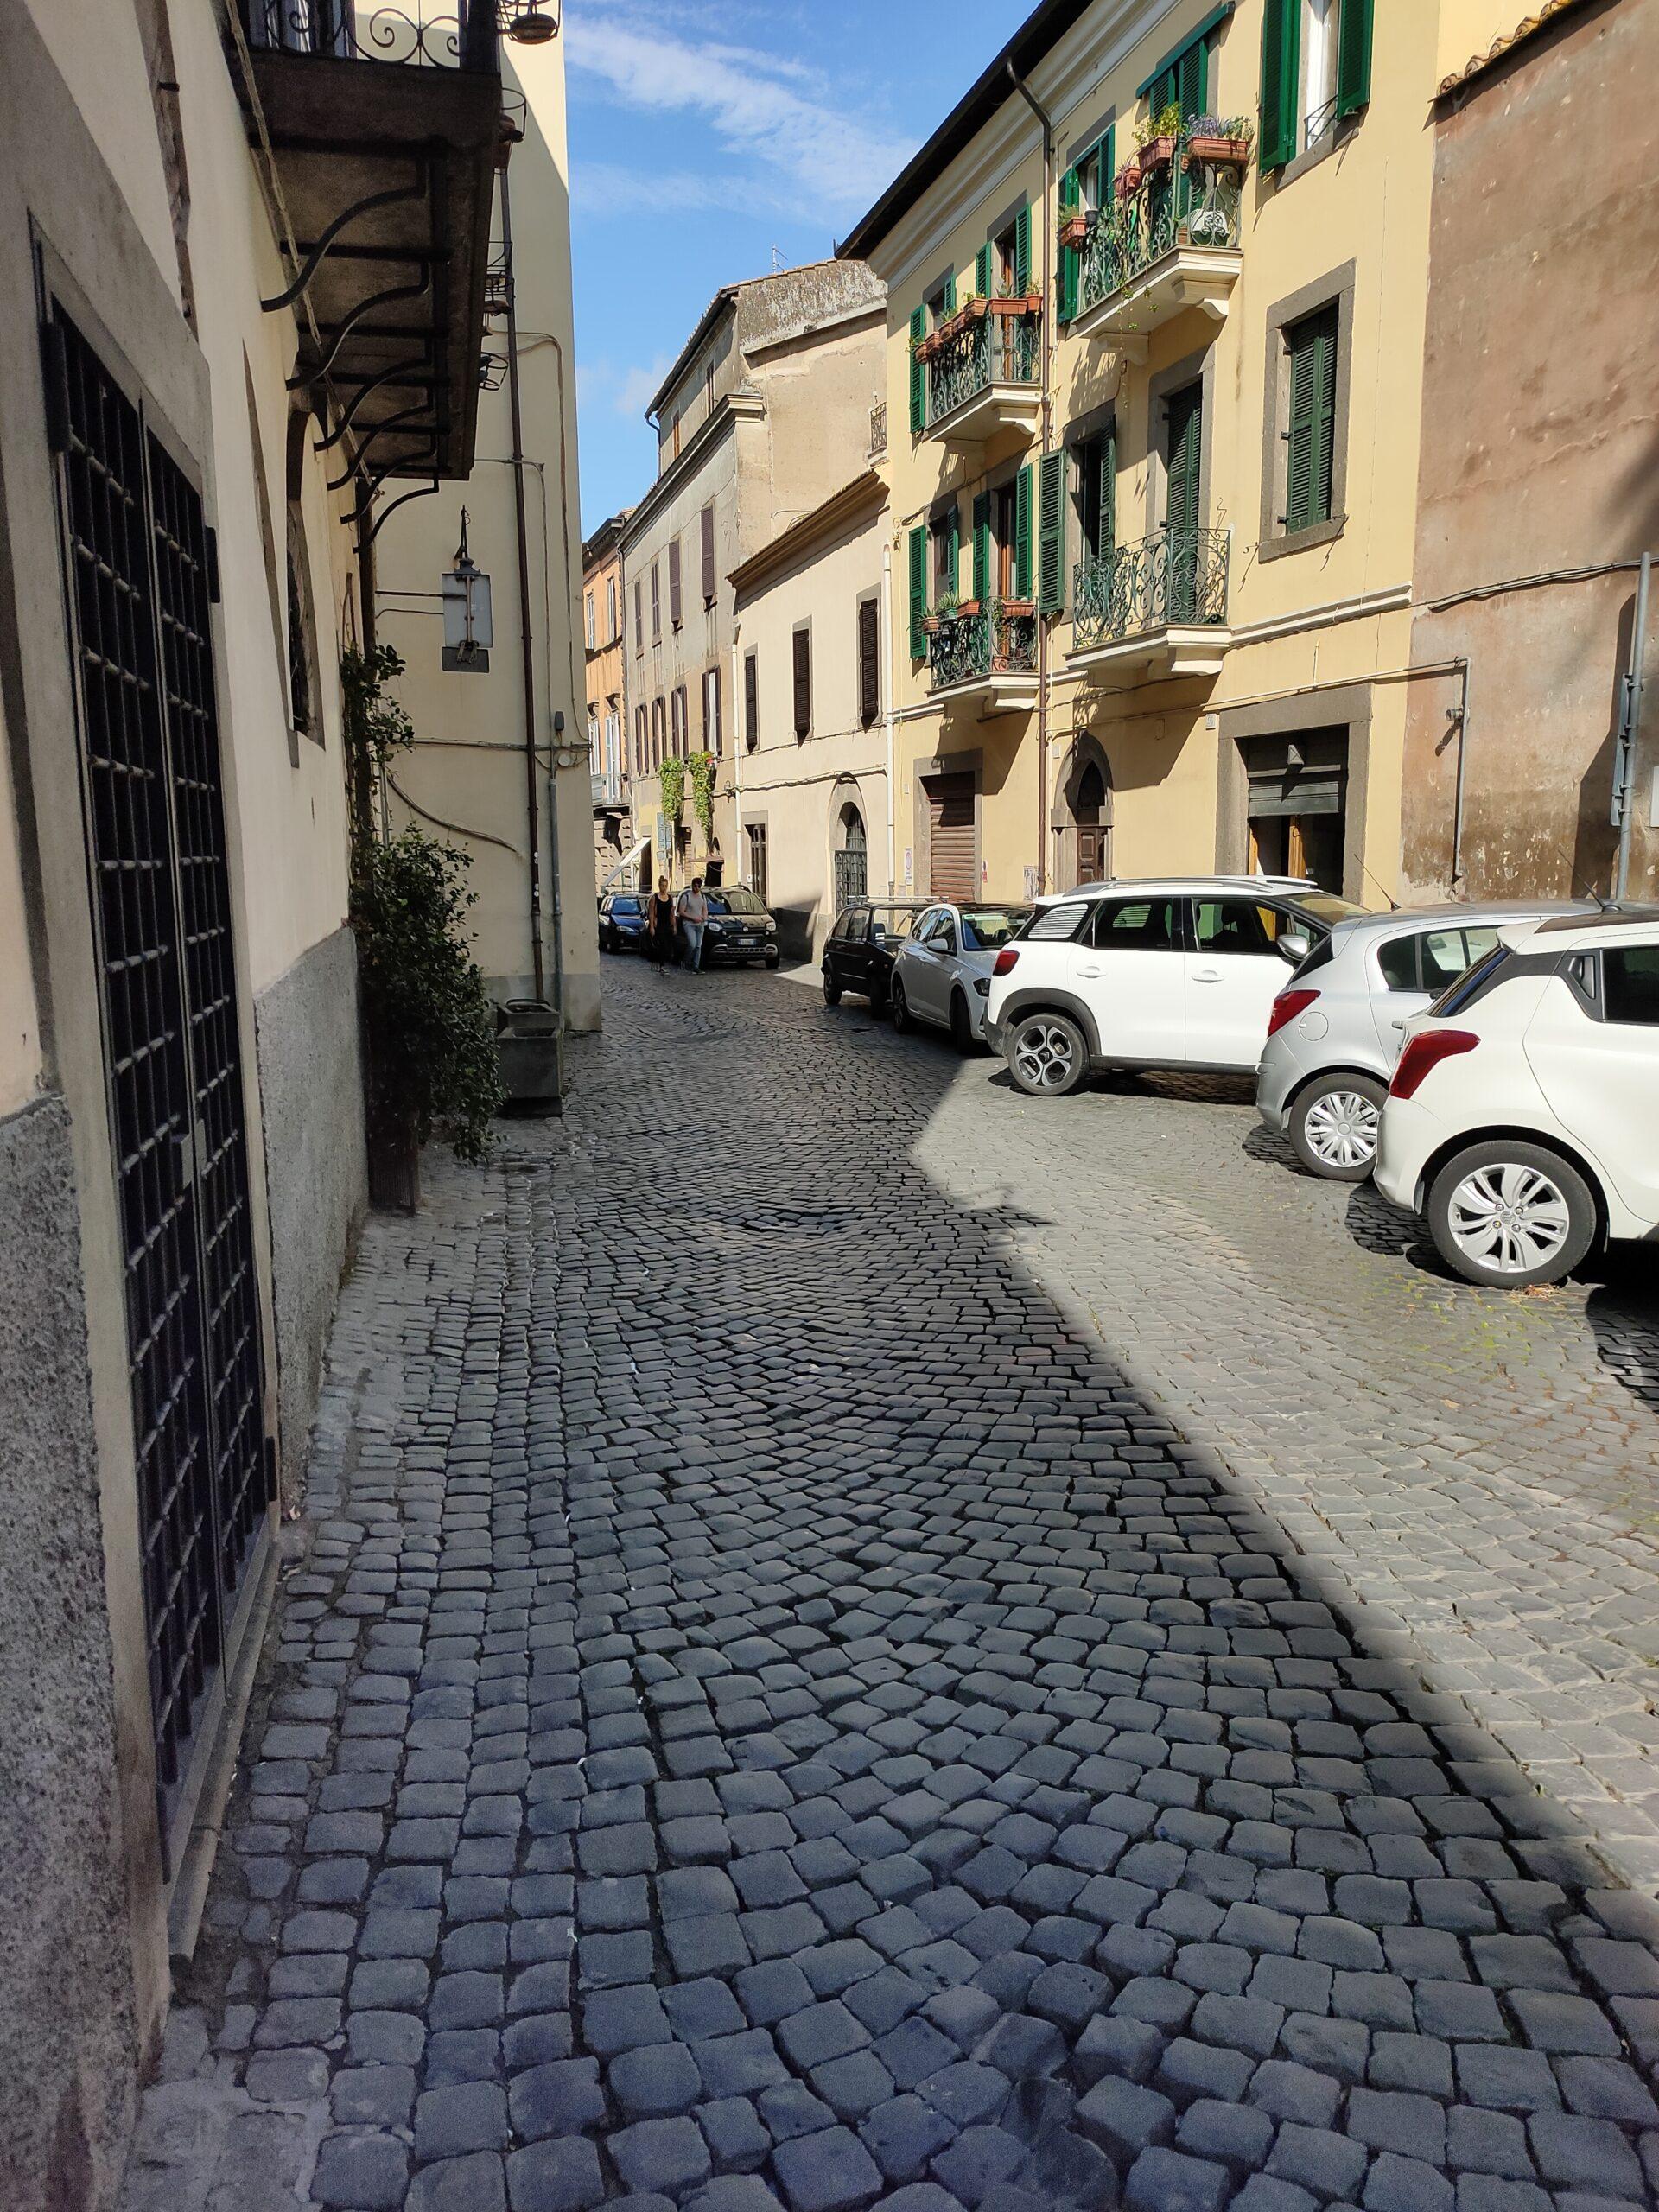 Viterbo, uomo vaga per via Cardinale la Fontaine perdendo sangue, poi insulta i vigili, paura in strada